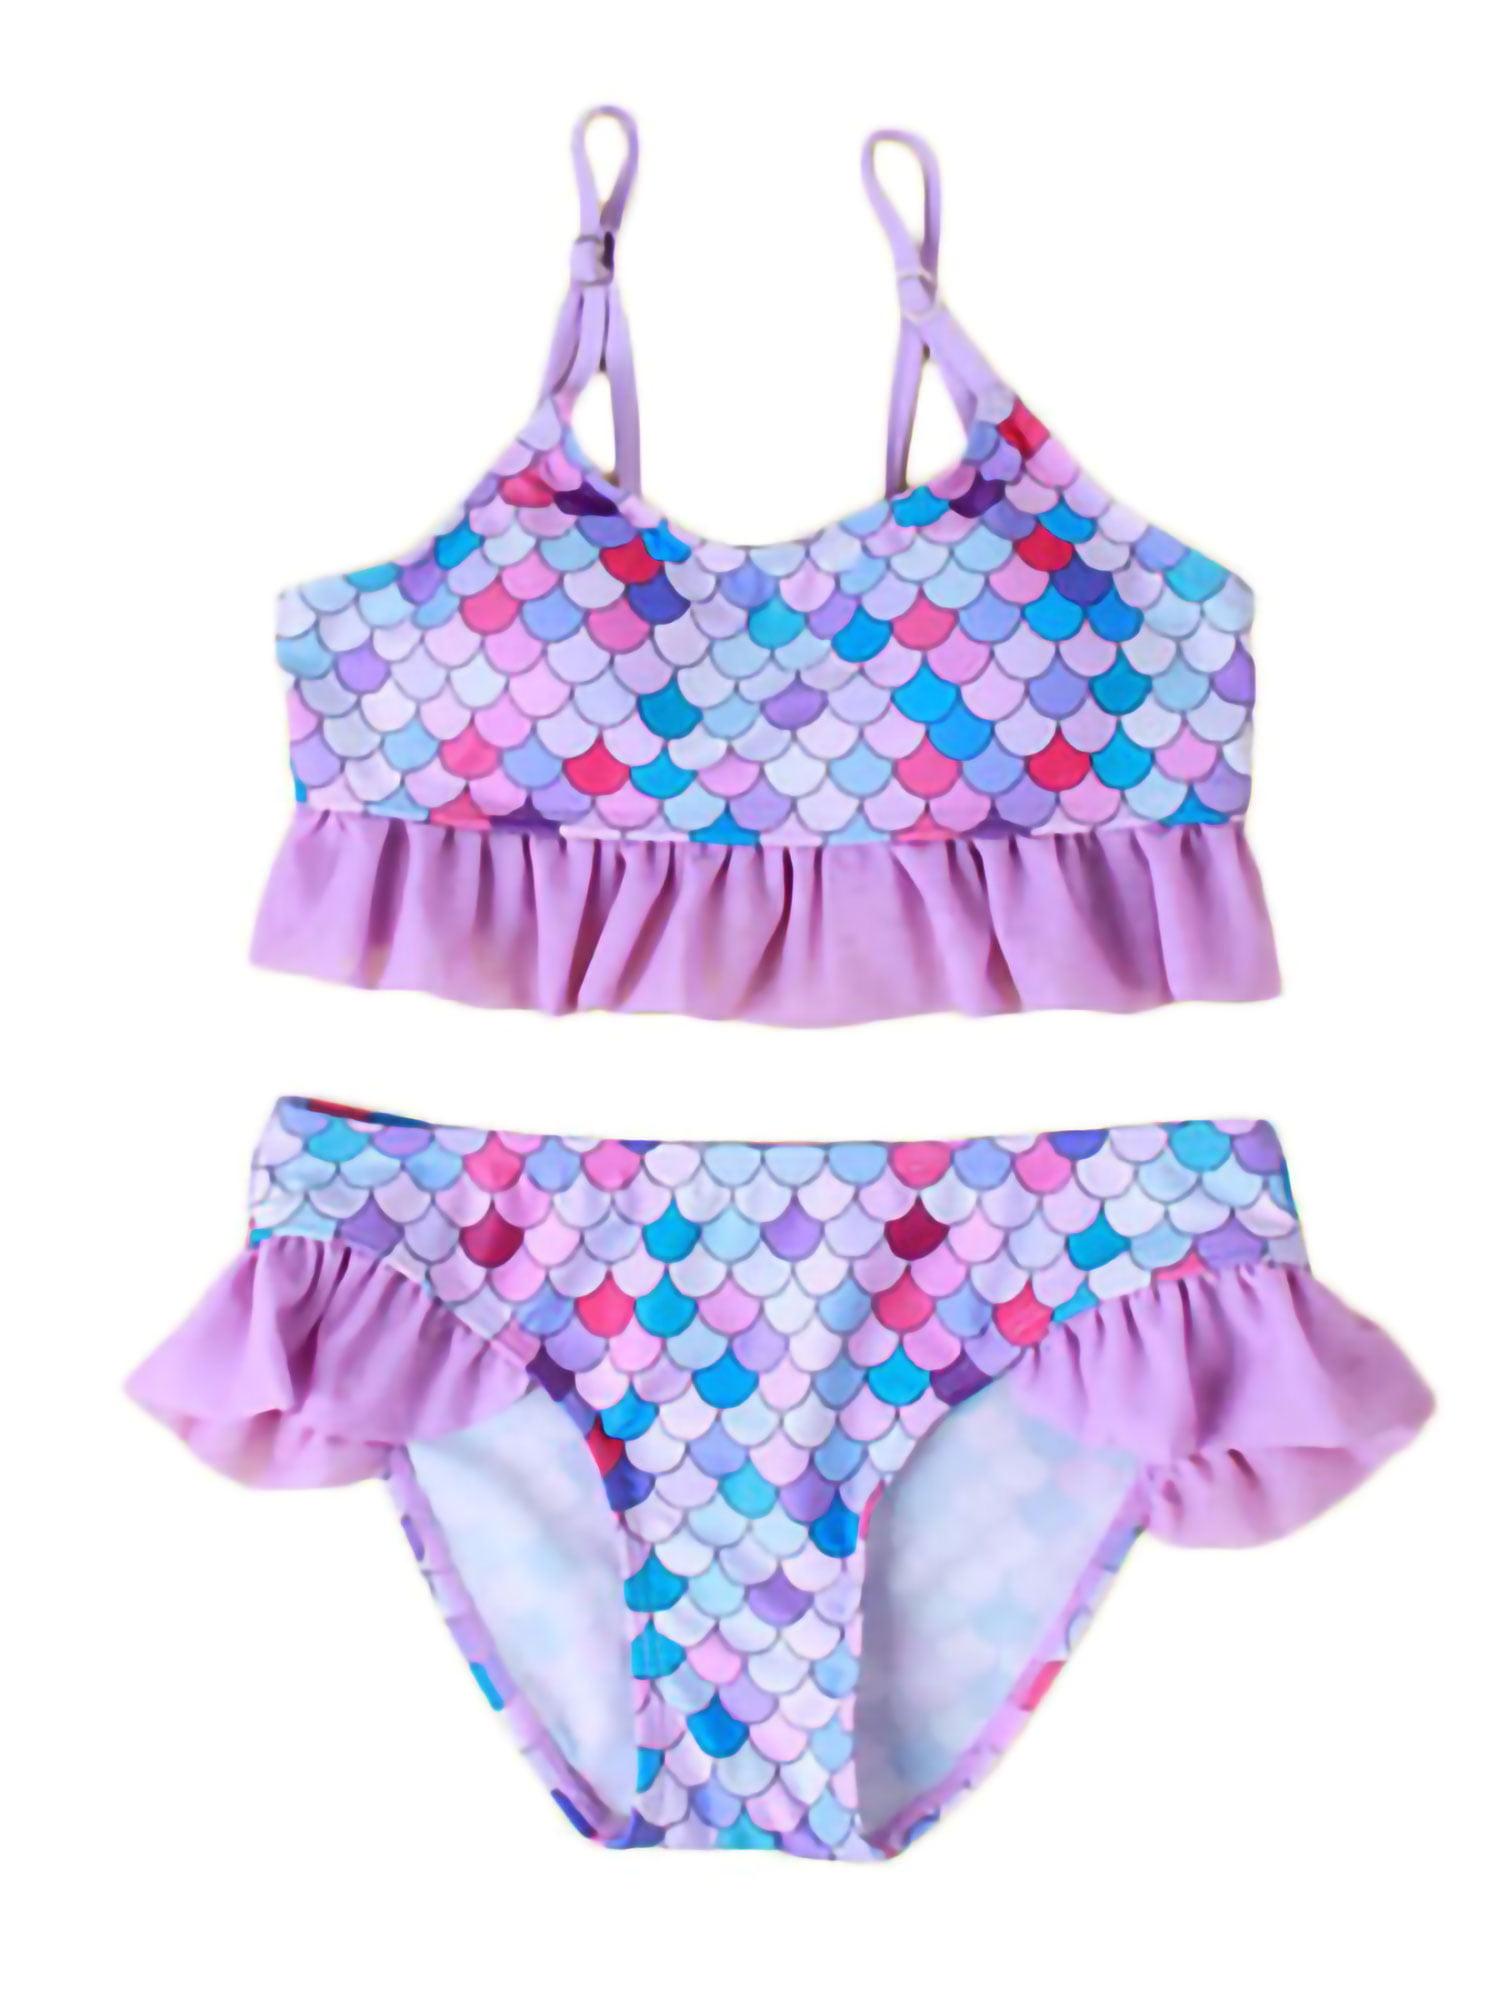 Girls Two Piece Printed Bikini Set Swimwear Kids Swimsuit Bathing Suit Beachwear